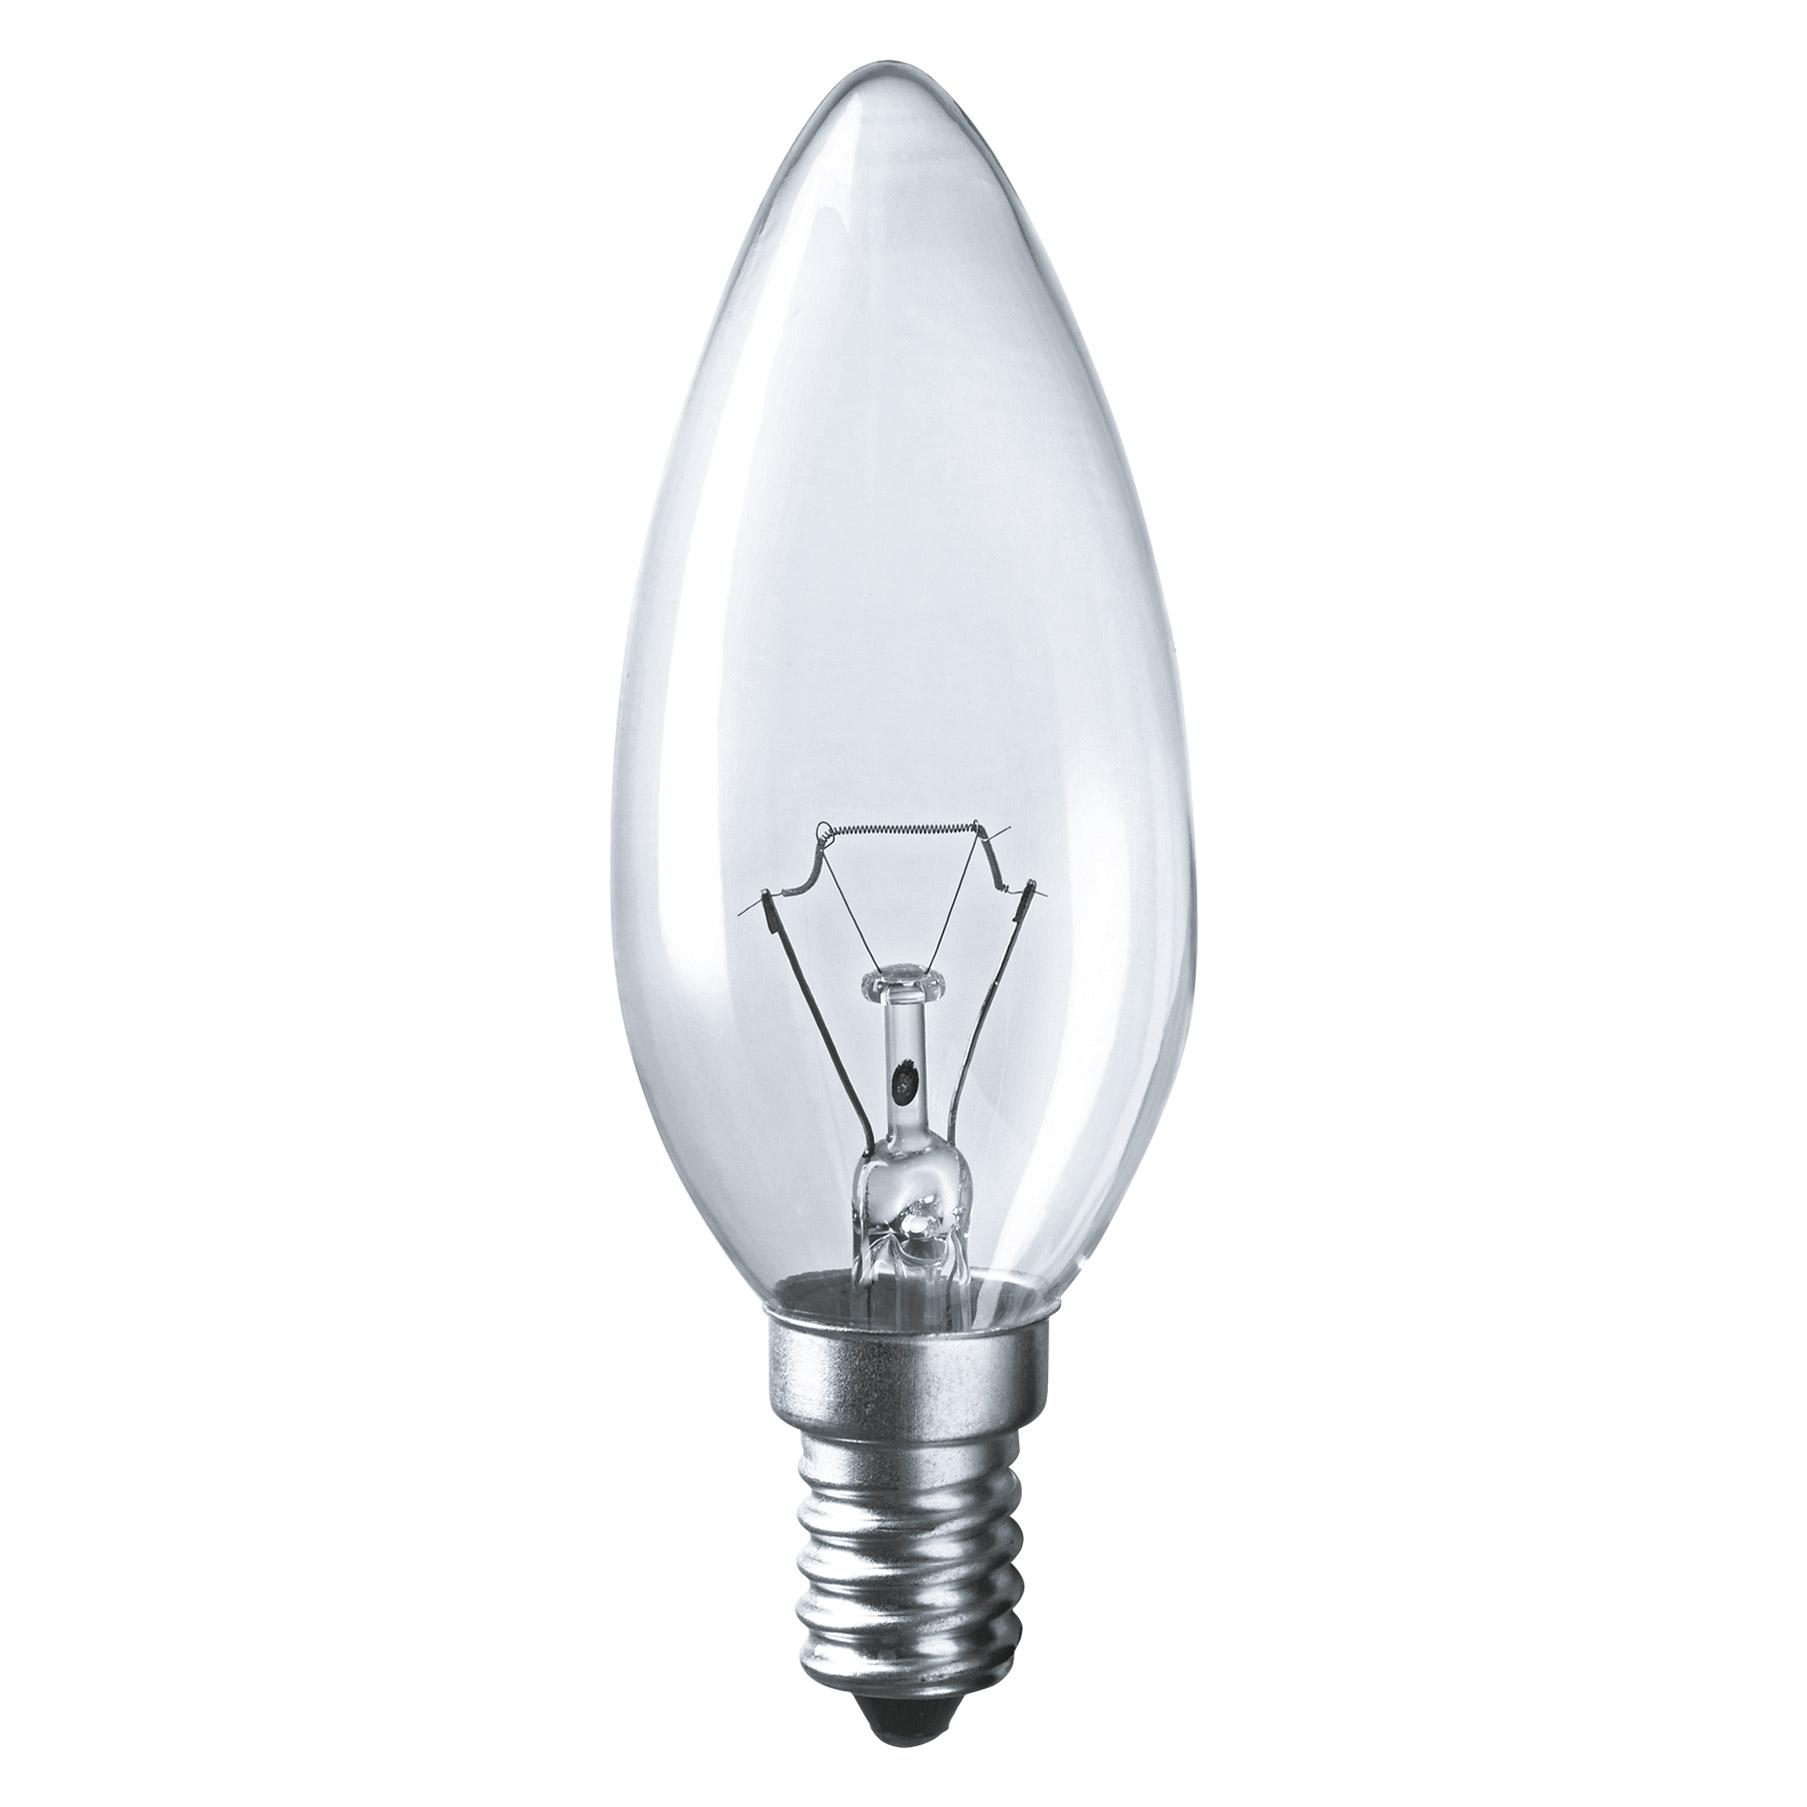 Лампа накаливания Navigator свеча прозрачная 60Вт цоколь E14